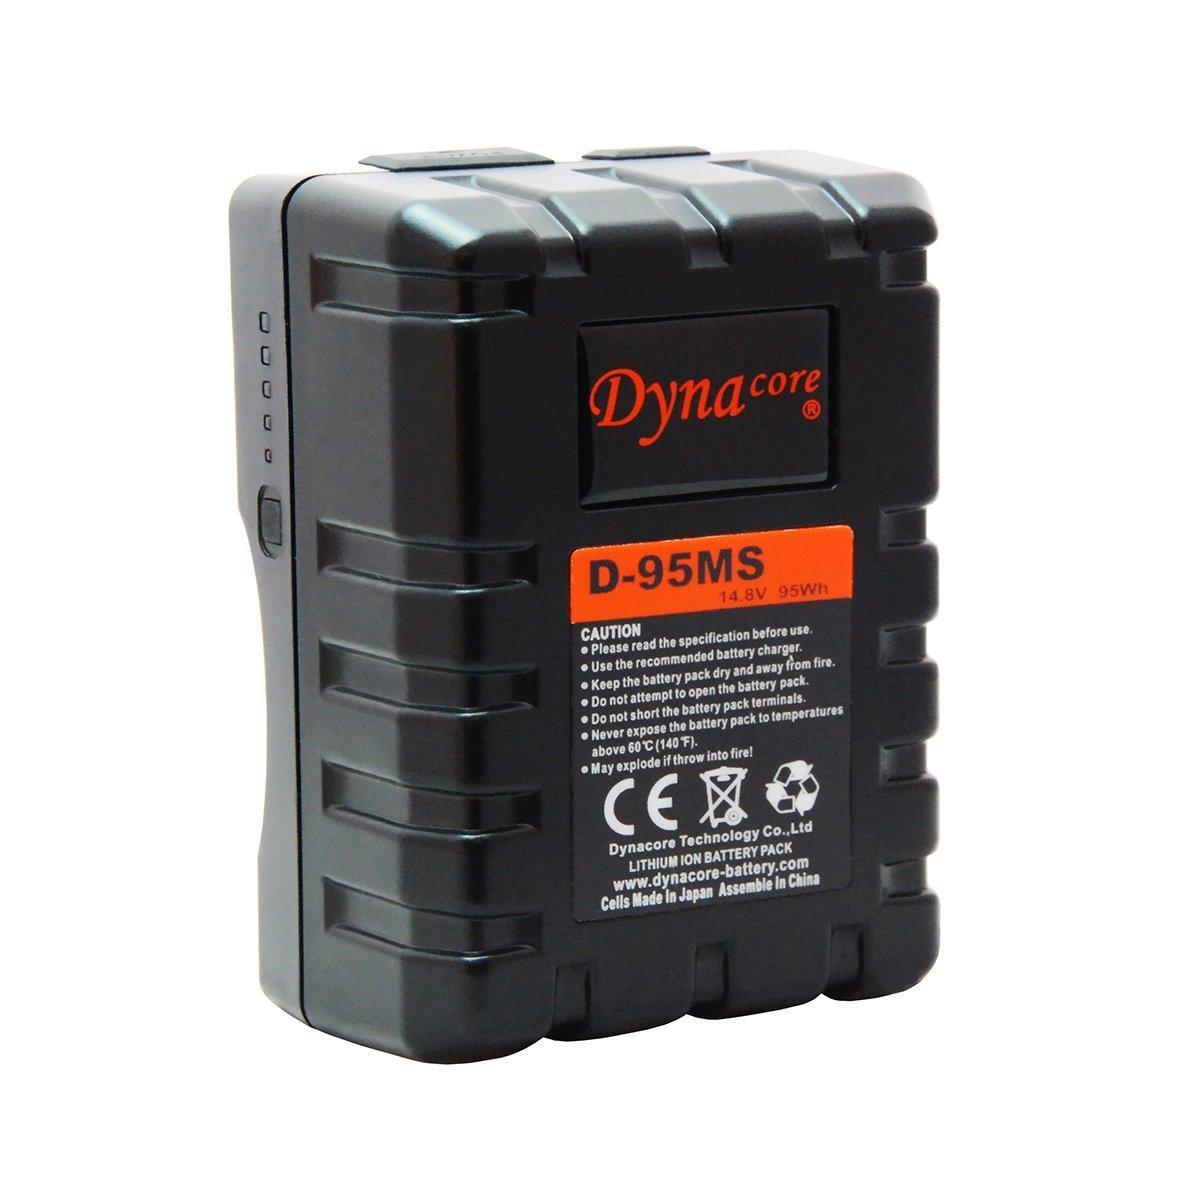 Dynacore D-95MS Mini 95Wh V-Mount Li-Ion Battery